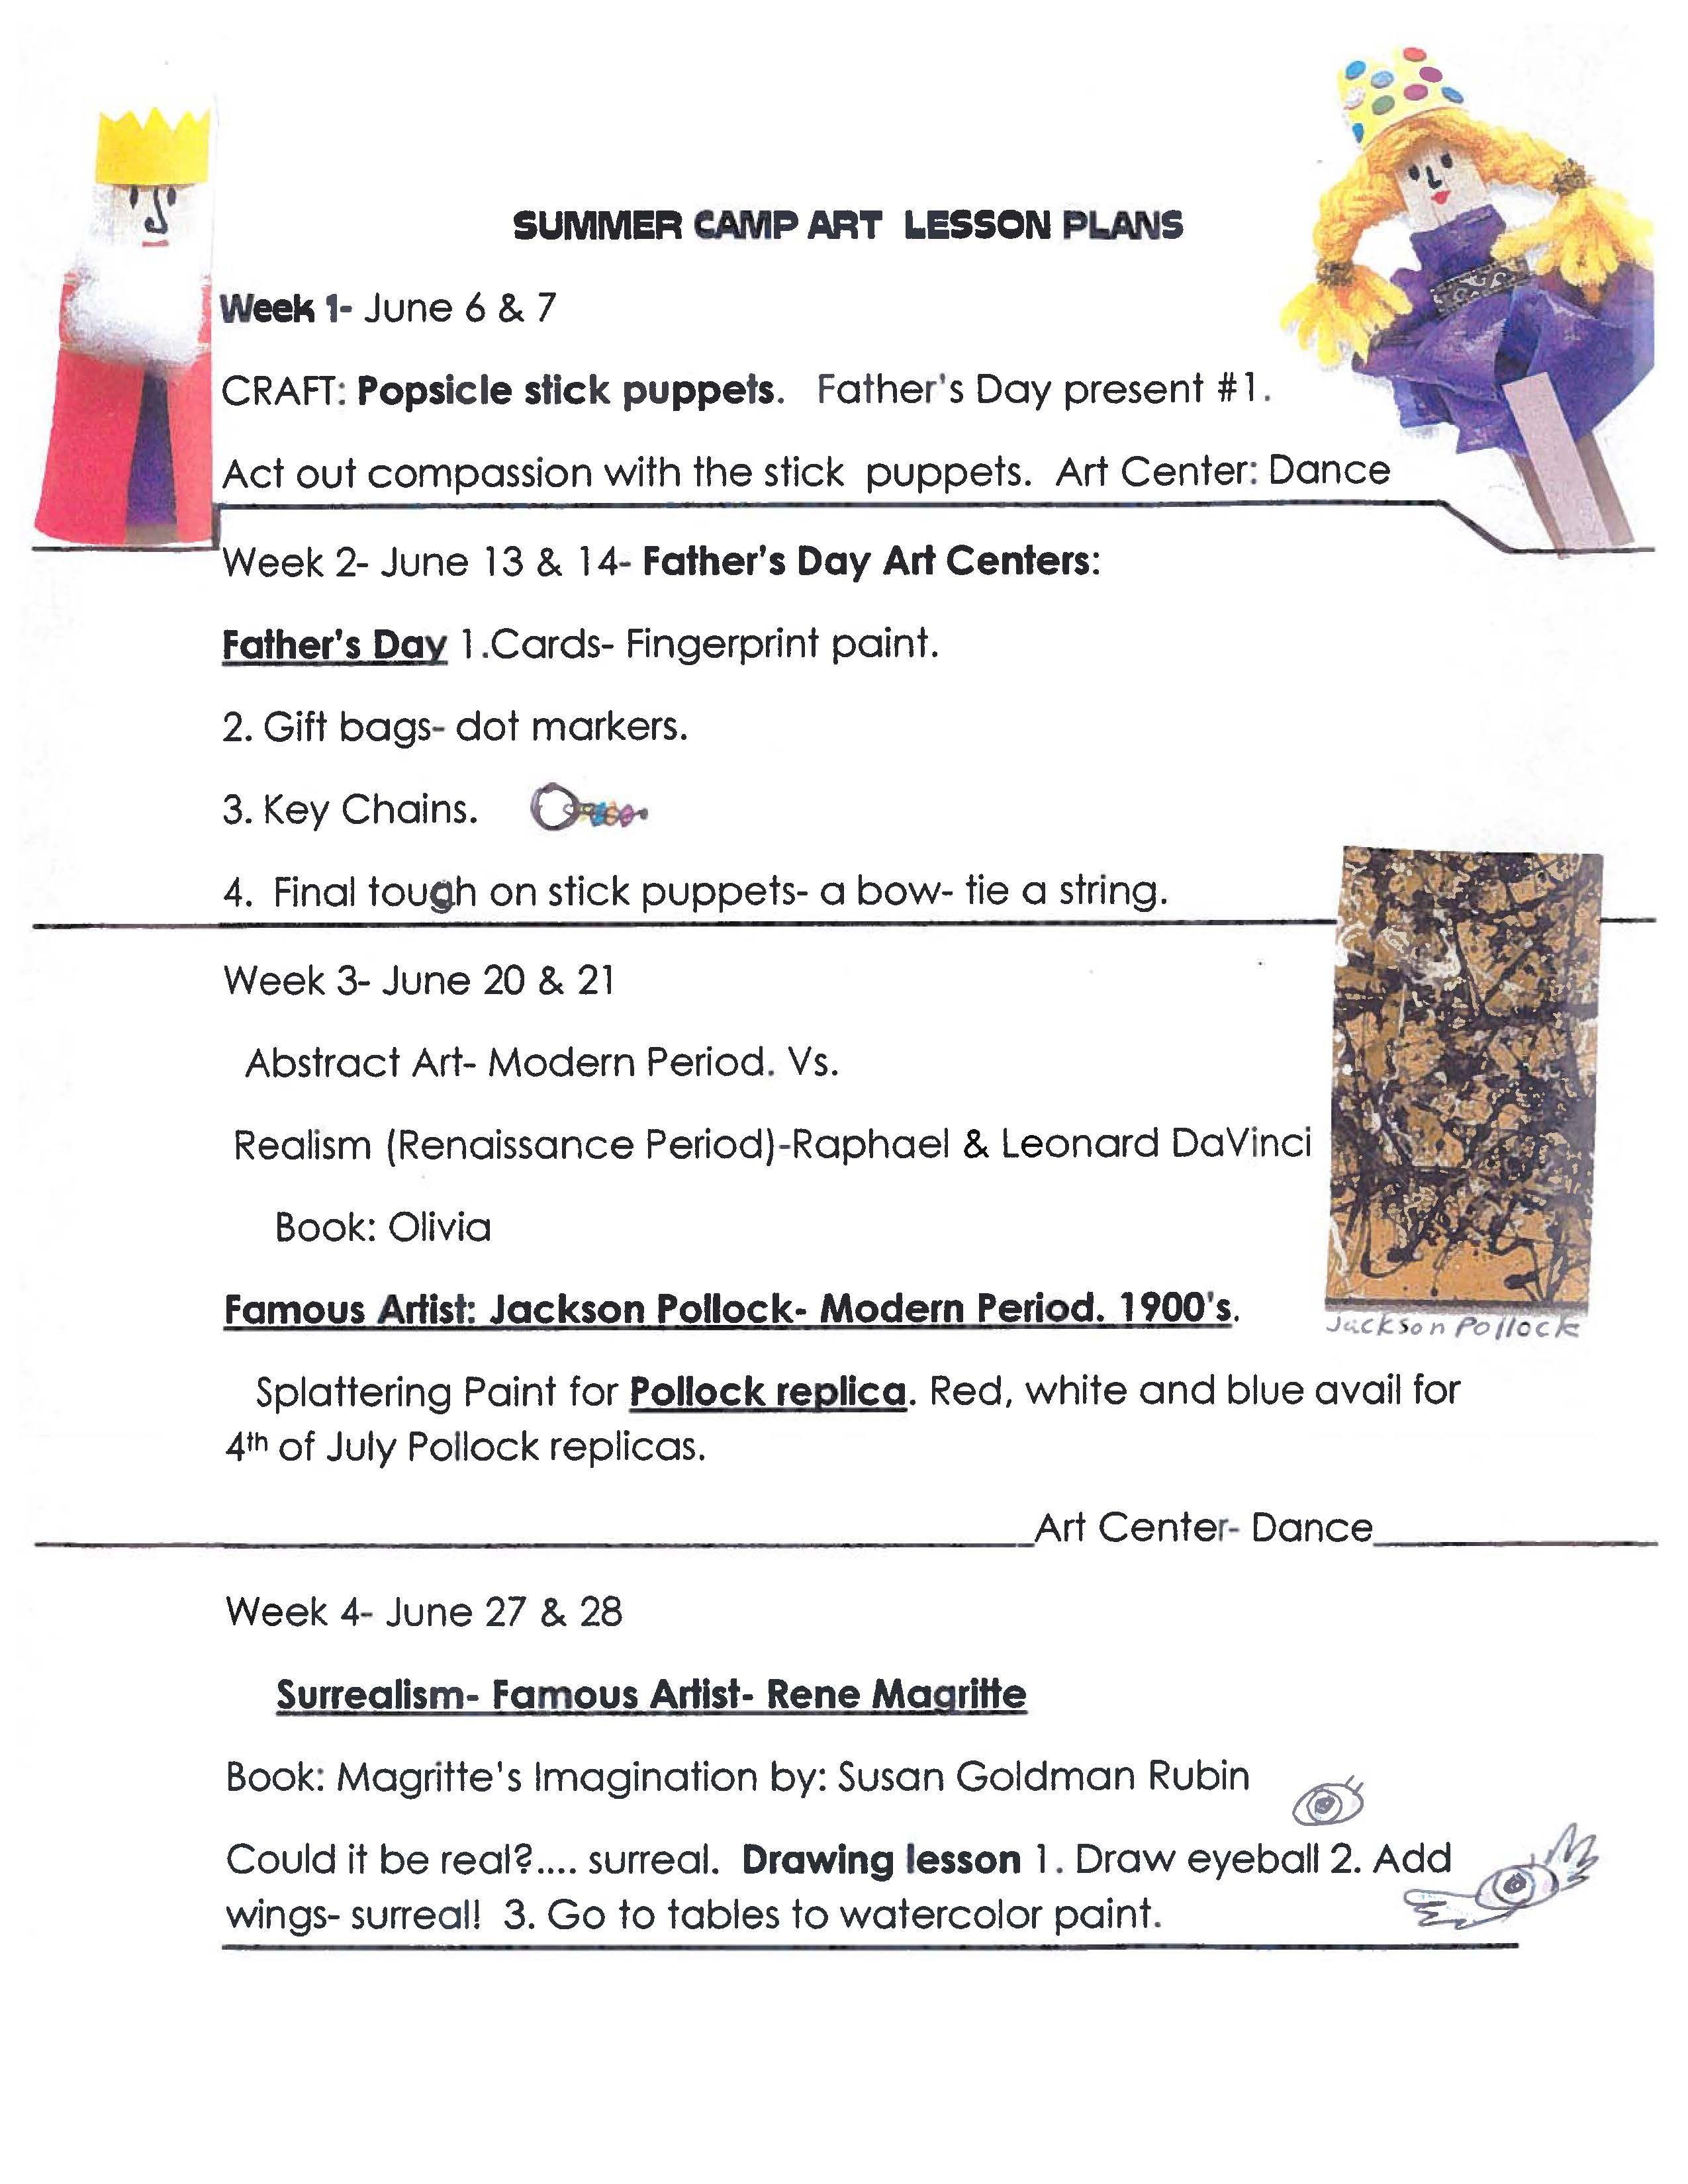 Art Lesson Plans For Summer Camp